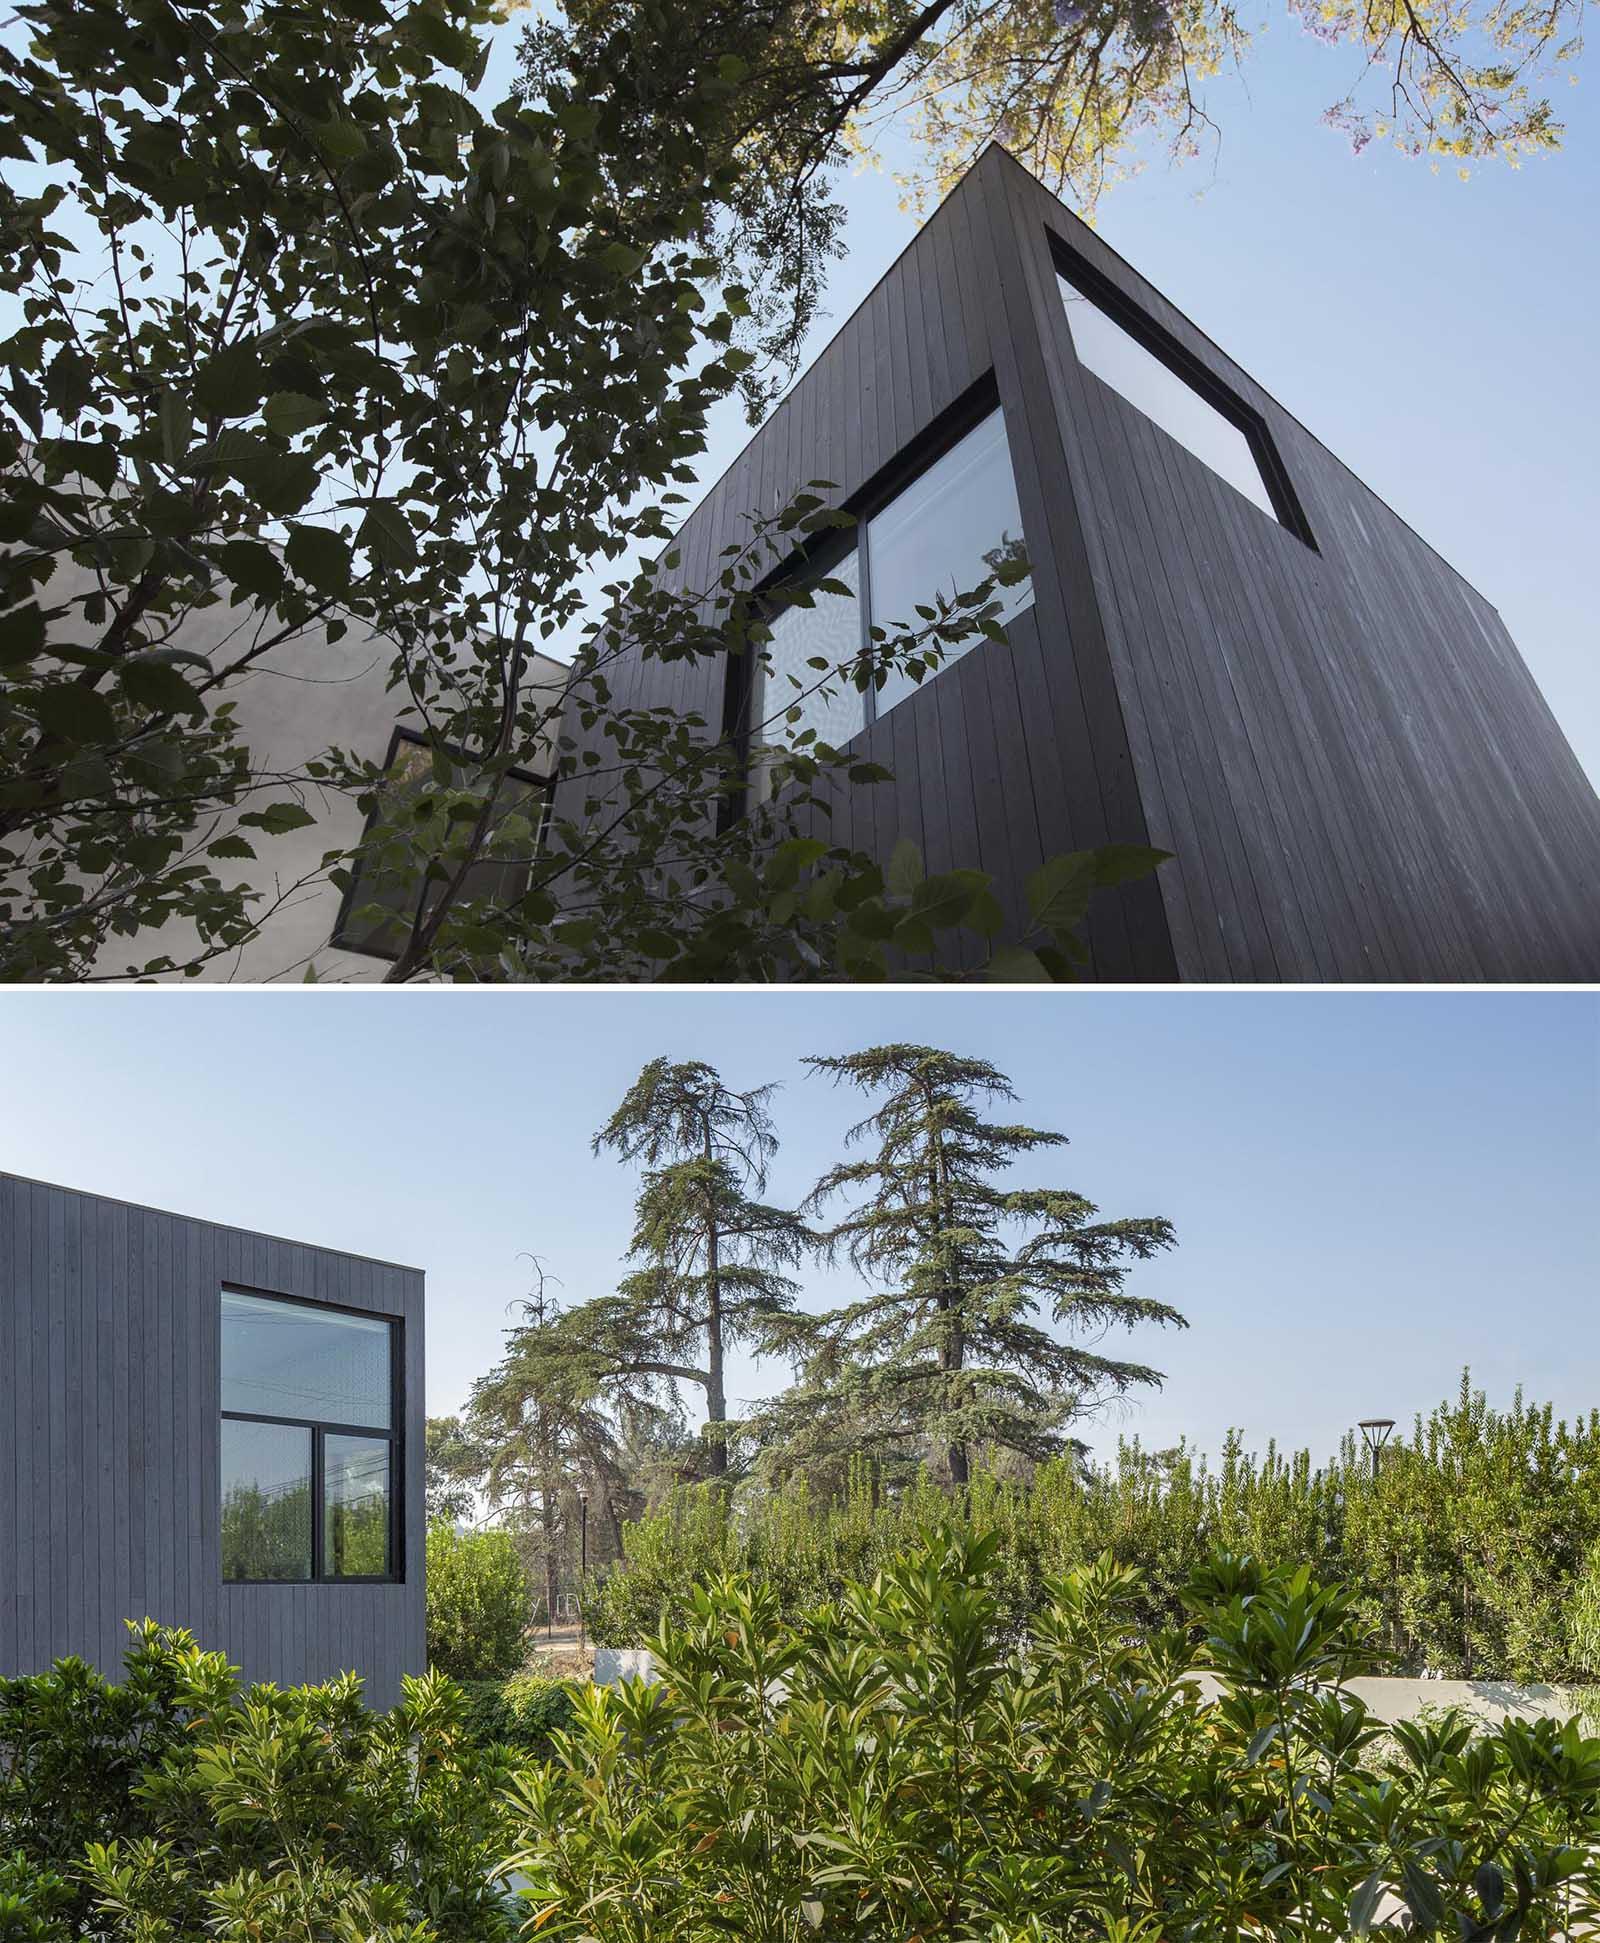 A modern house with Shou Sugi Ban exterior siding.